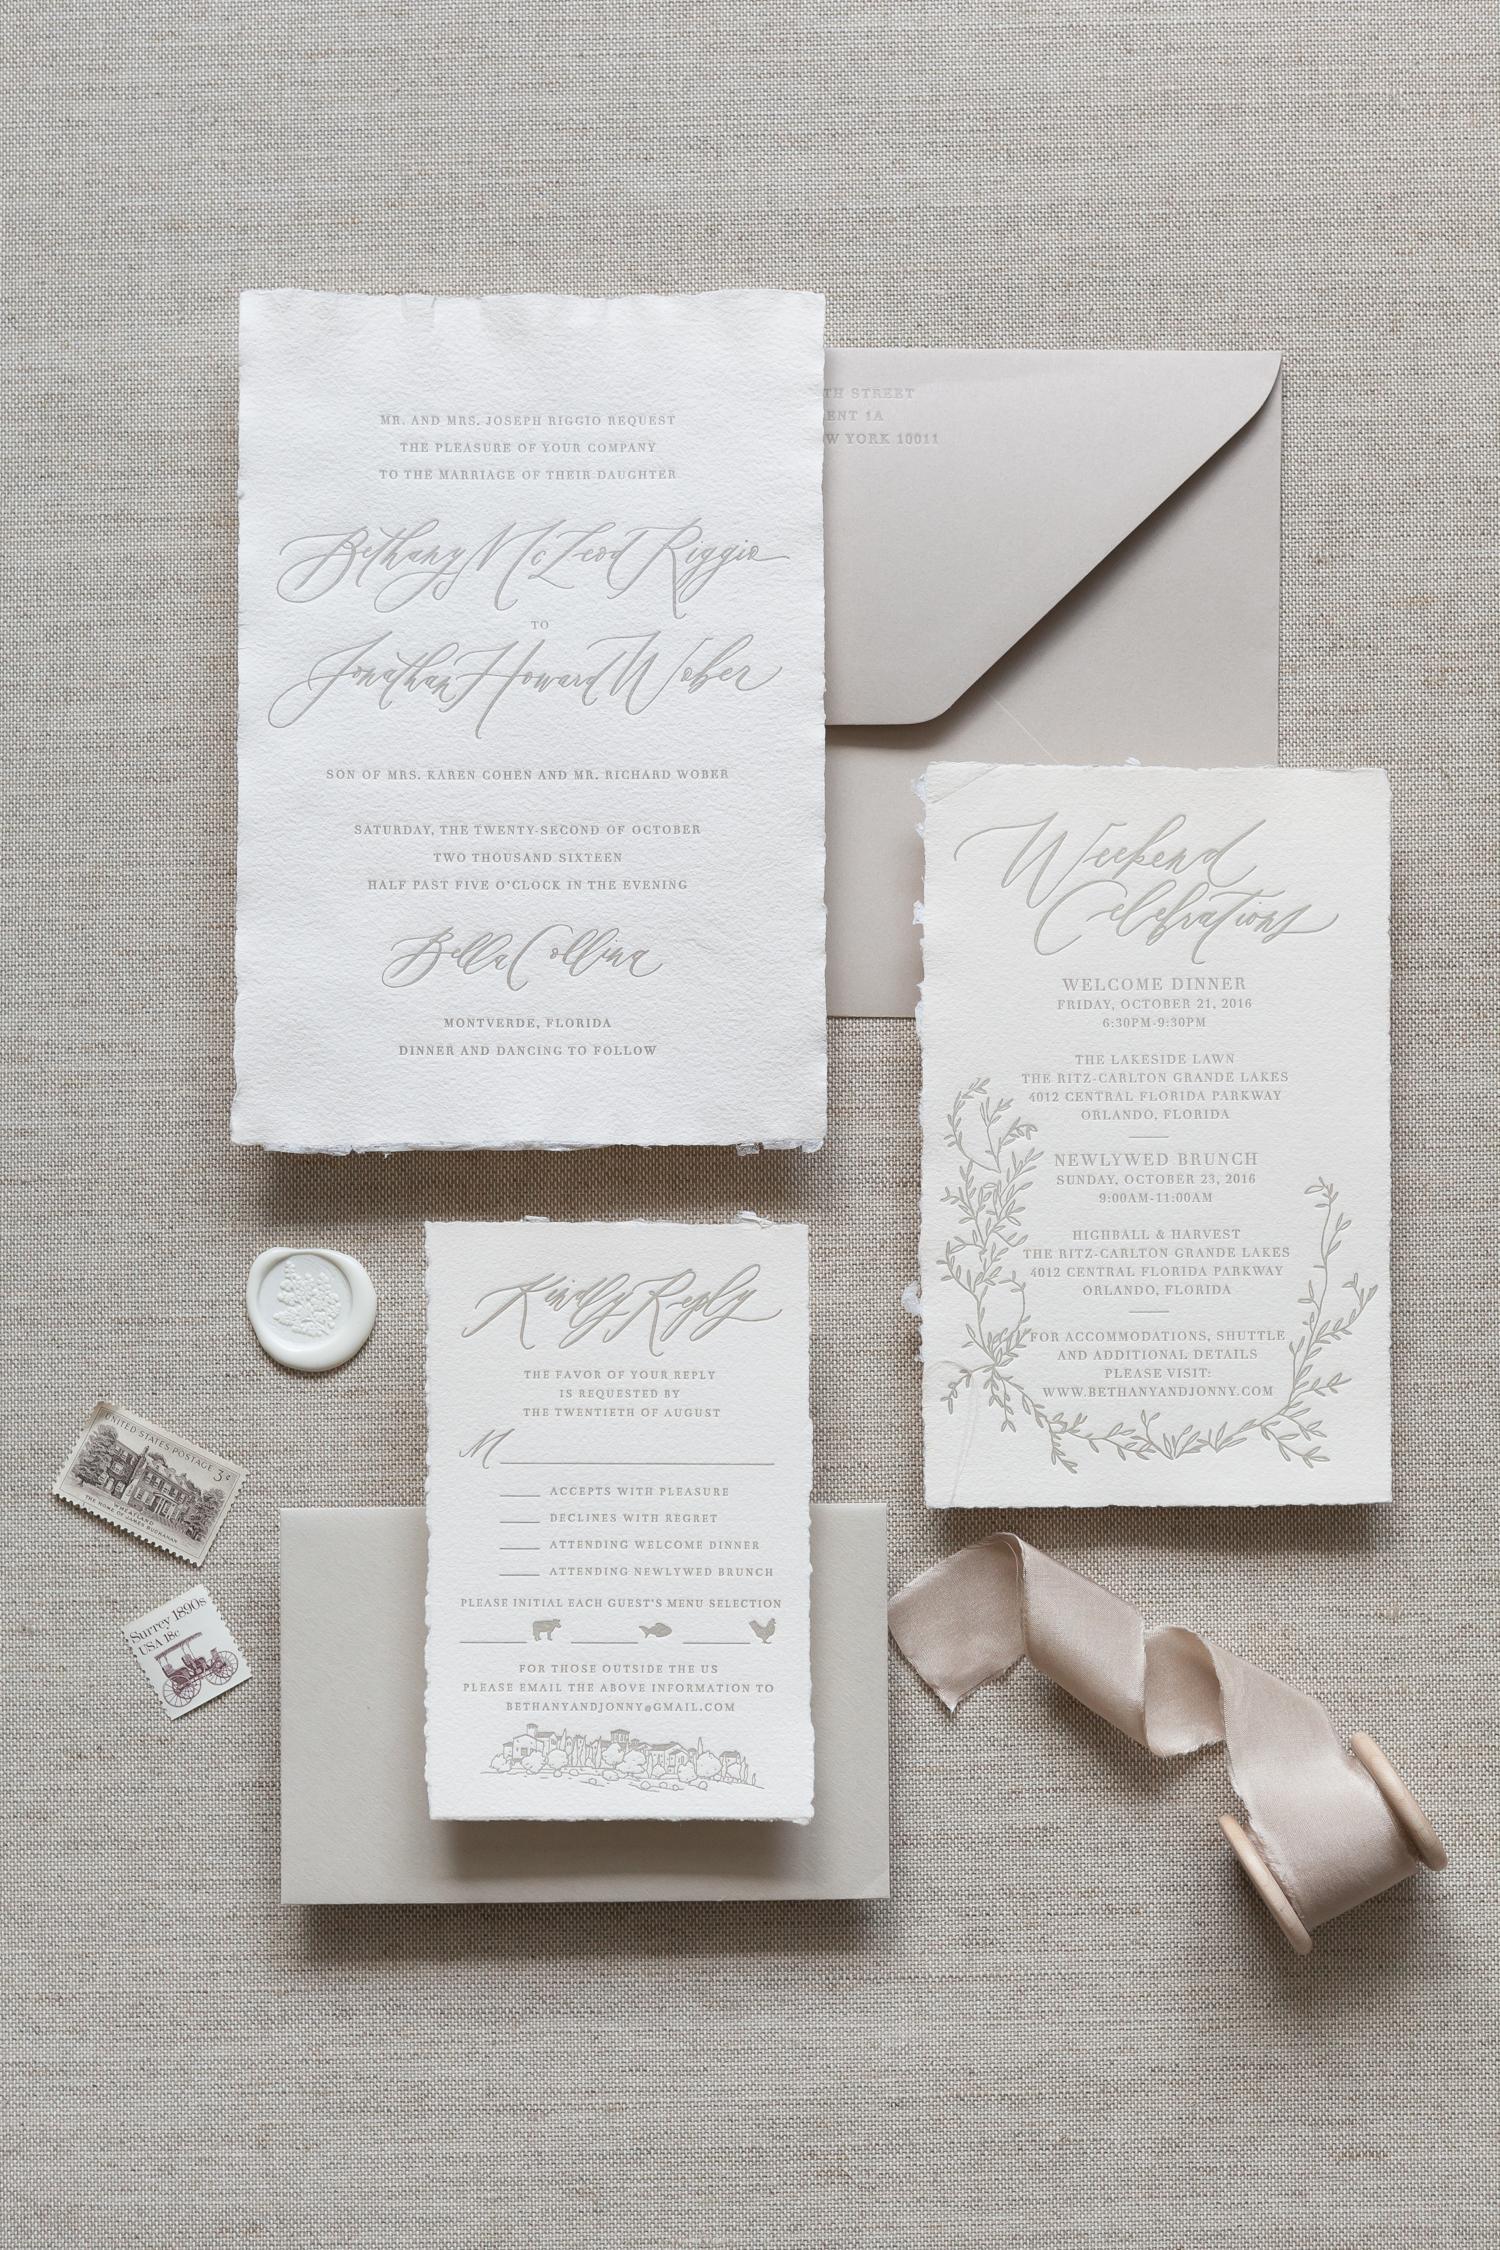 invitation with greenery motifs